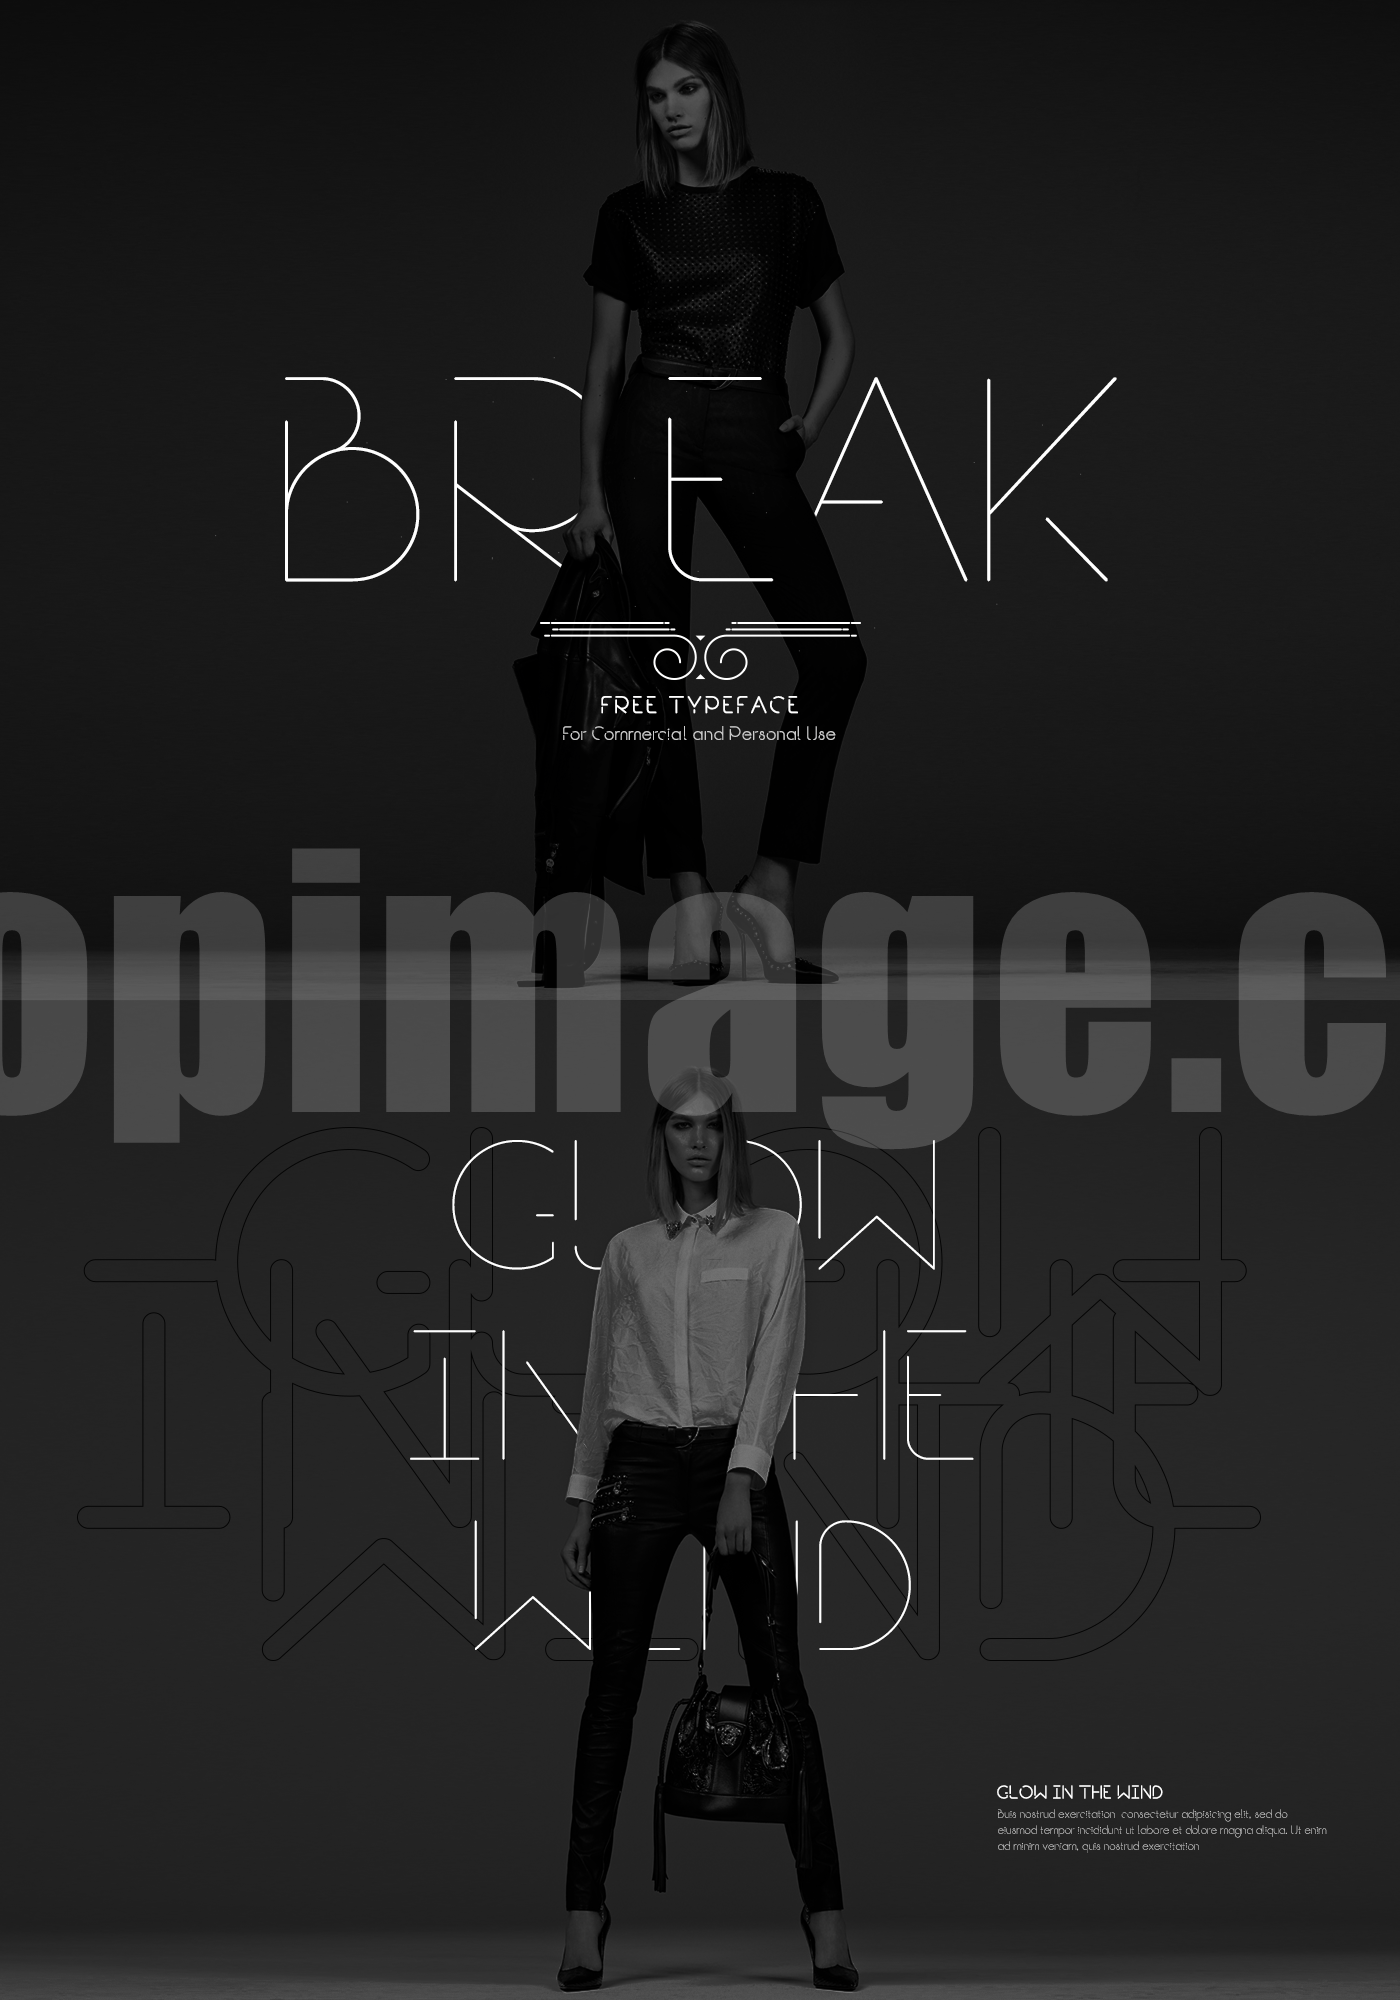 break极简纤细时尚英文字体适合logo素材下载